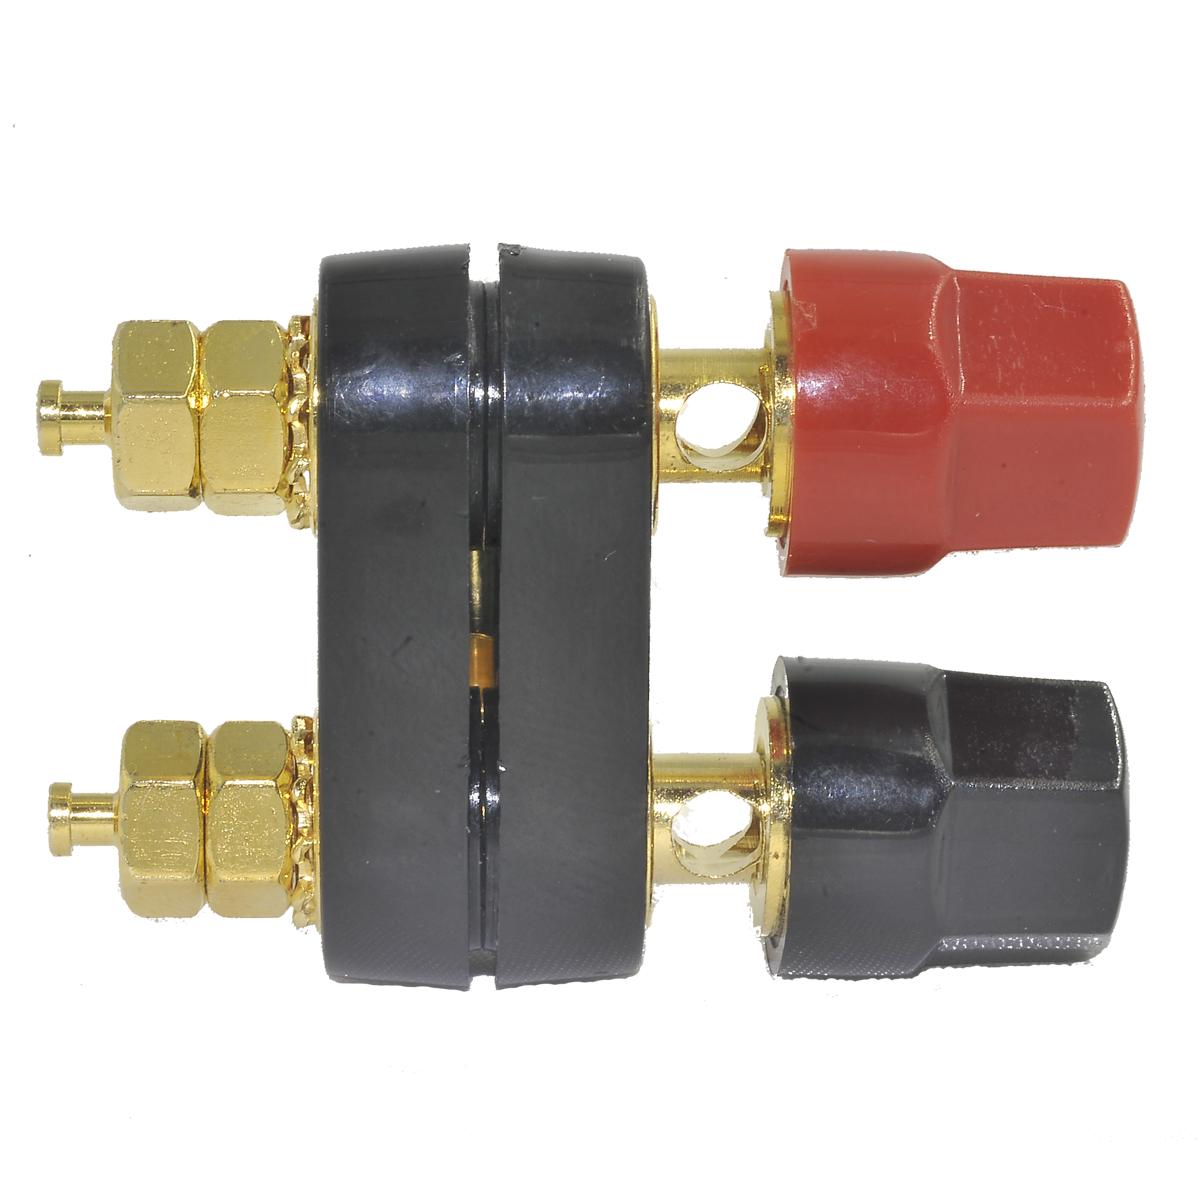 audio speaker amplifier terminal dual binding post banana plug jack socket cable connectors pcb. Black Bedroom Furniture Sets. Home Design Ideas